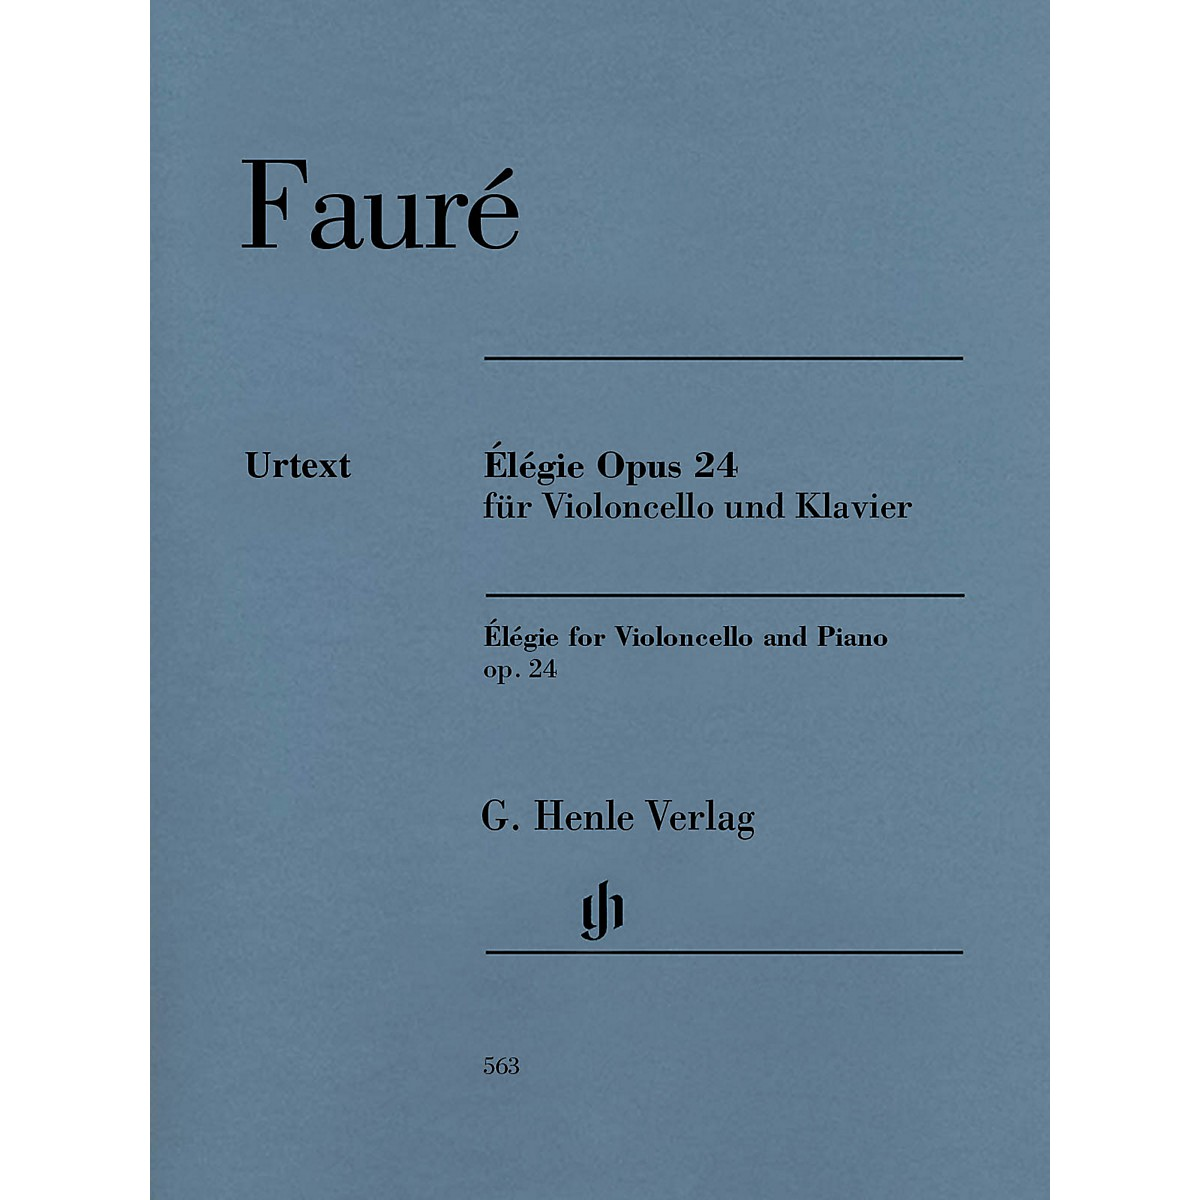 G. Henle Verlag Gabriel Fauré - Élégie for Violoncello and Piano, Op. 24 Henle Music by Fauré Edited by Monnier